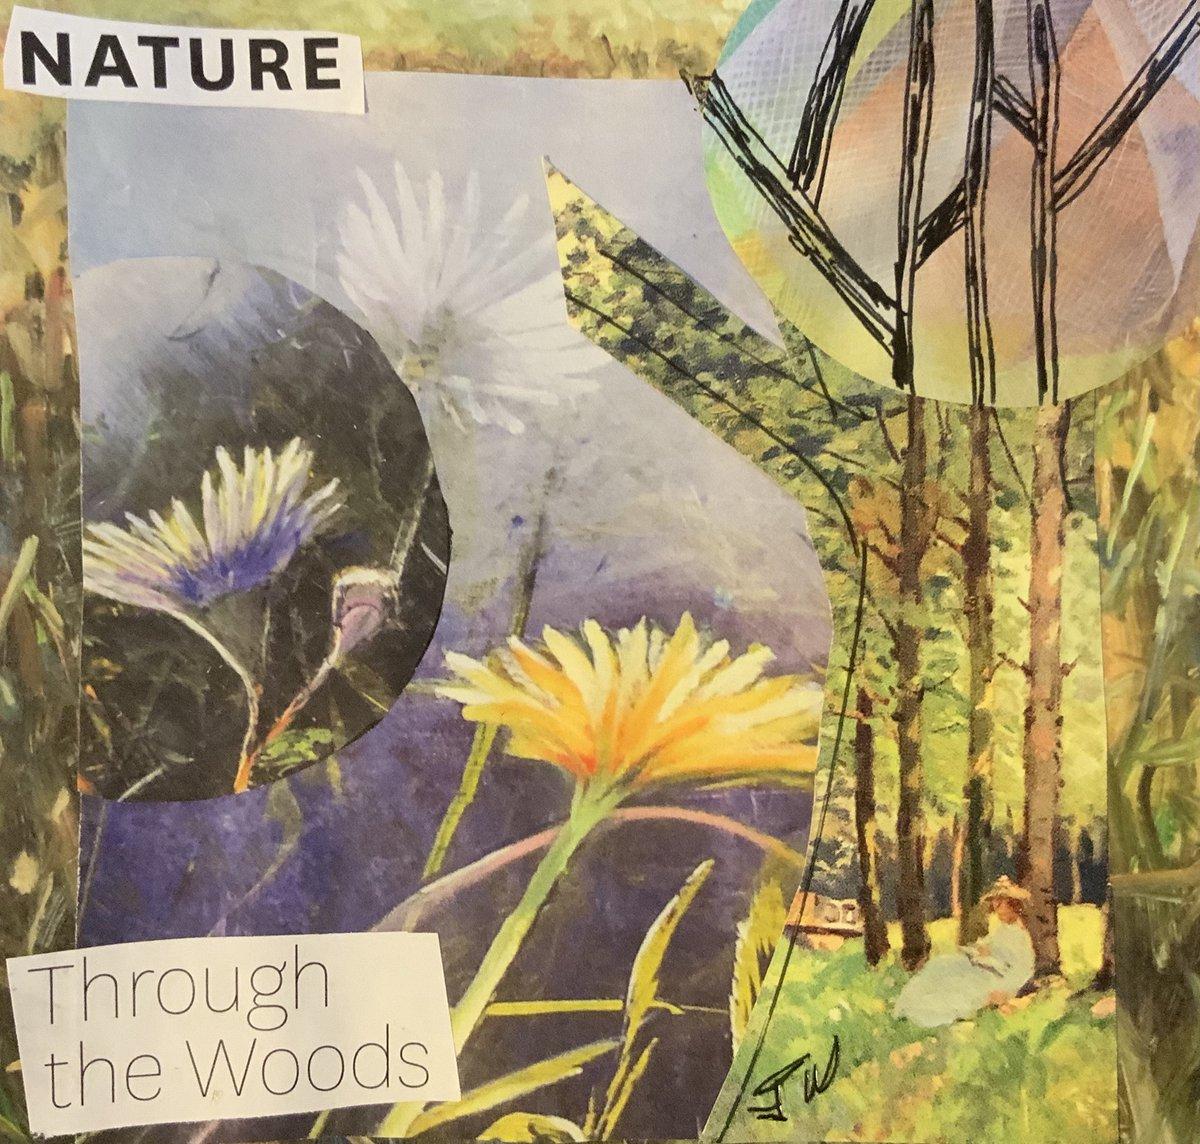 Tree a Day #treeaday #tree #treeart #treelove #art #collage #recyclemagazine #nature #throughthewoods #garden #flowers #seriesart #smallart #paperart #wednesdayart #abstractlandscape #greens #janicewilliamsart